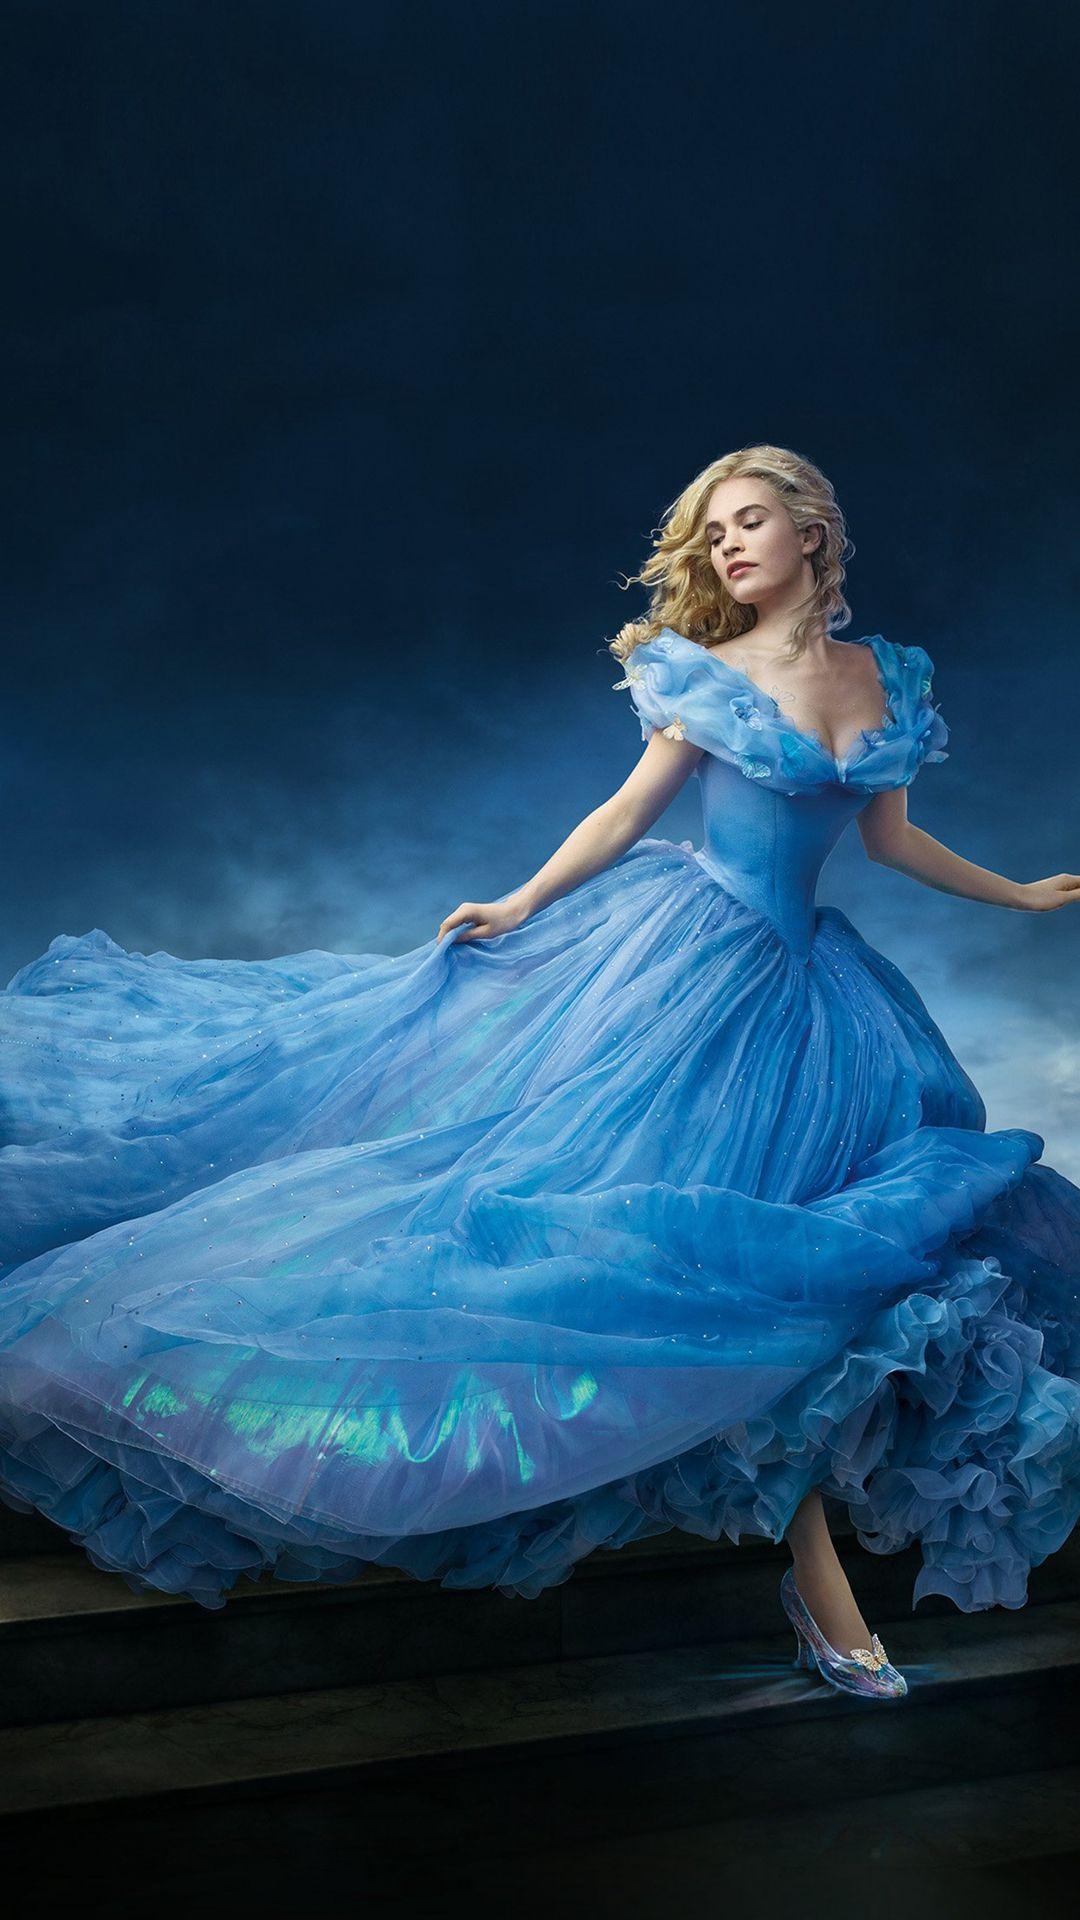 Cinderella Dress Blue Art Iphone 6 Wallpaper Download Iphone Wallpapers Ipad Wallpapers One Stop Cinderella Movie Cinderella Dresses Cinderella Live Action